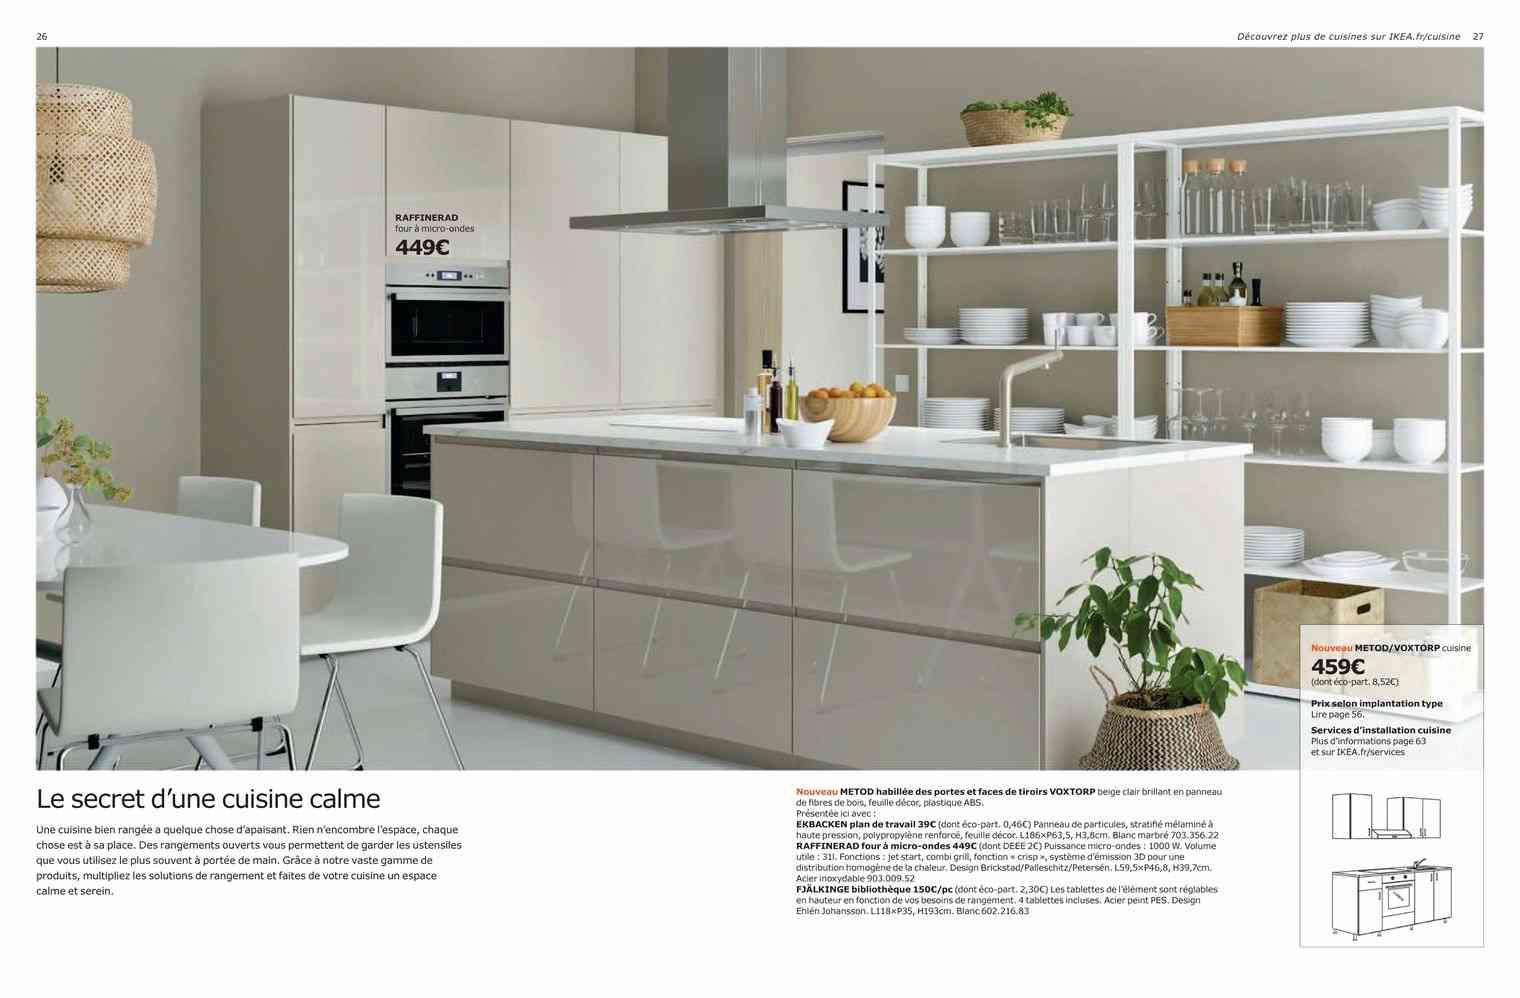 Cuisine Ikea Ringhult Blanc Frais Photos Promotion Cuisine Ikea Génial Cuisine Ikea Ringhult Blanc Brillant